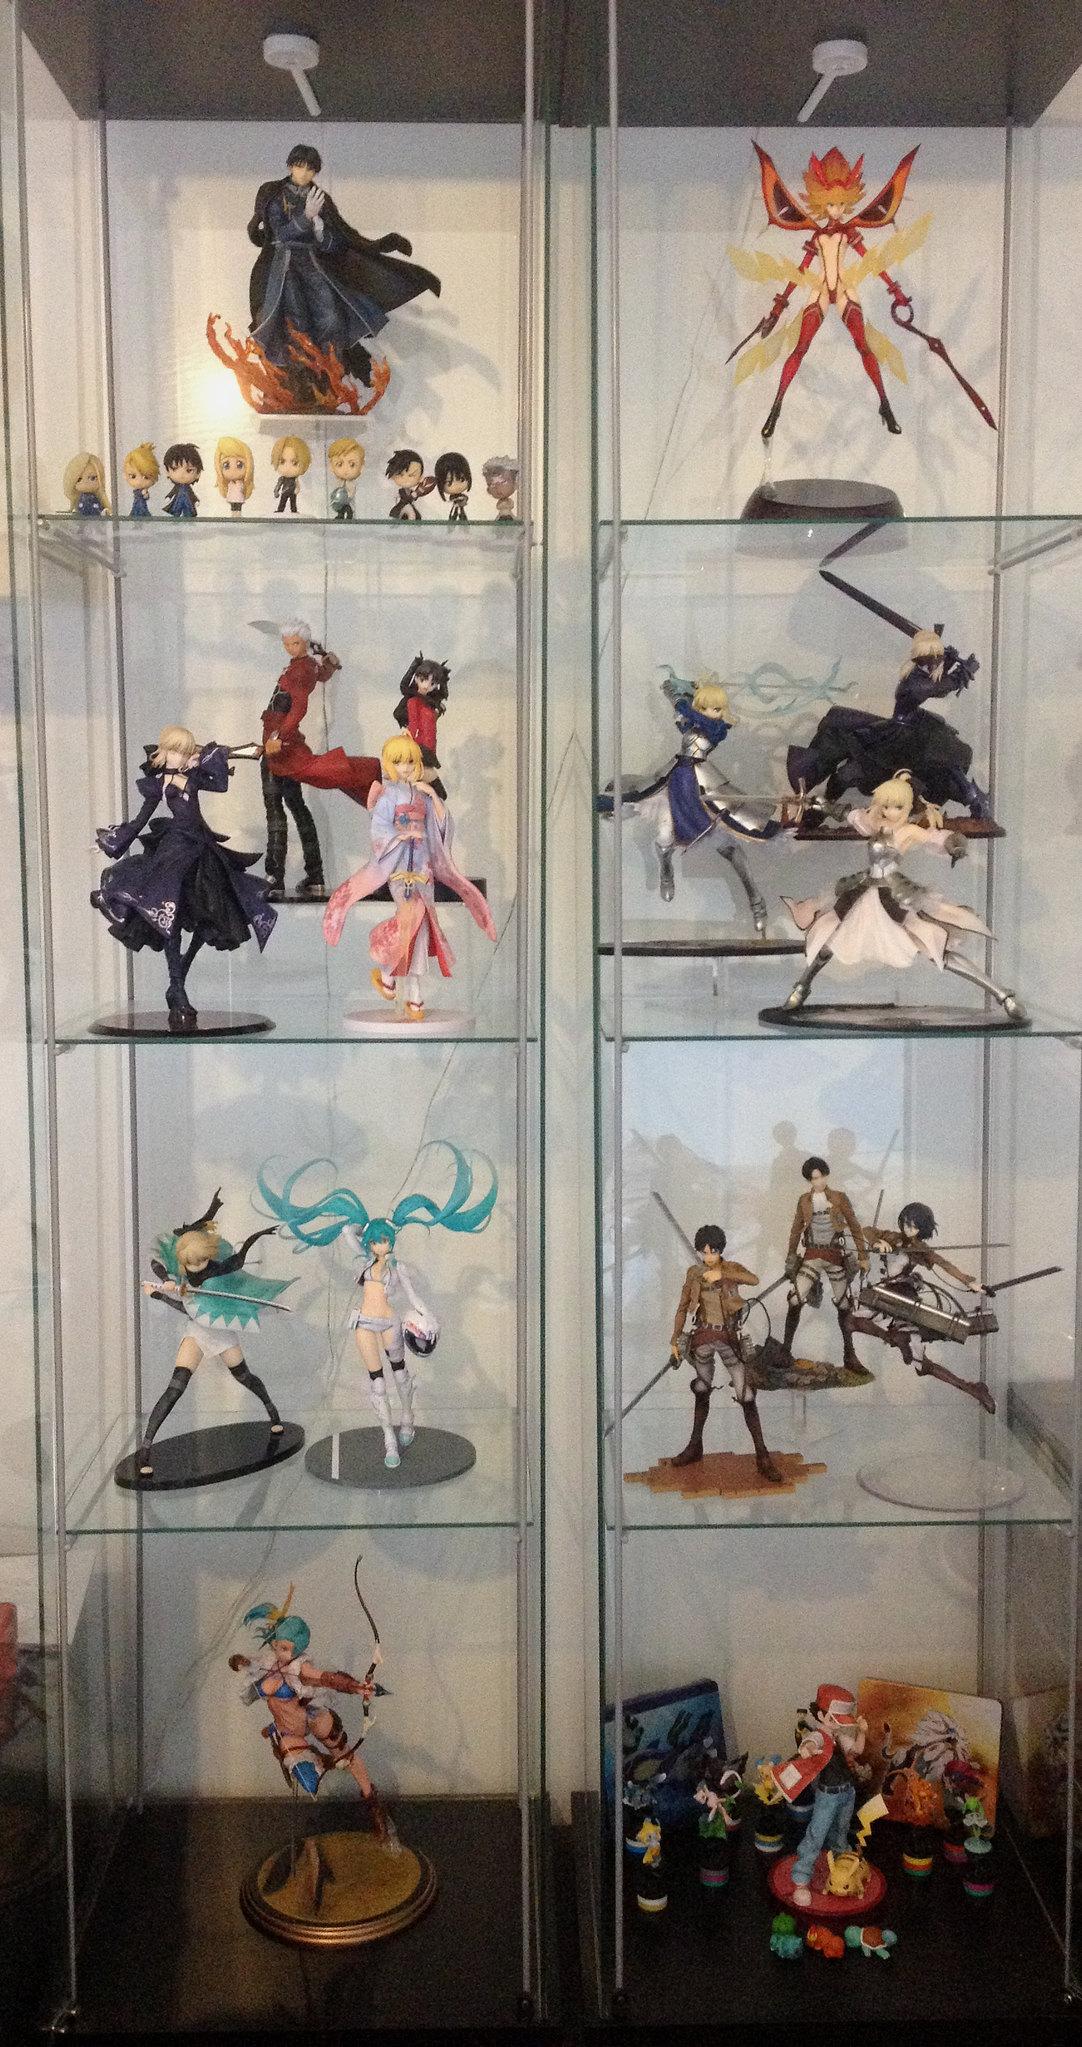 Asian comics:  Manga and Anime 36843487696_d5f107e2e5_k